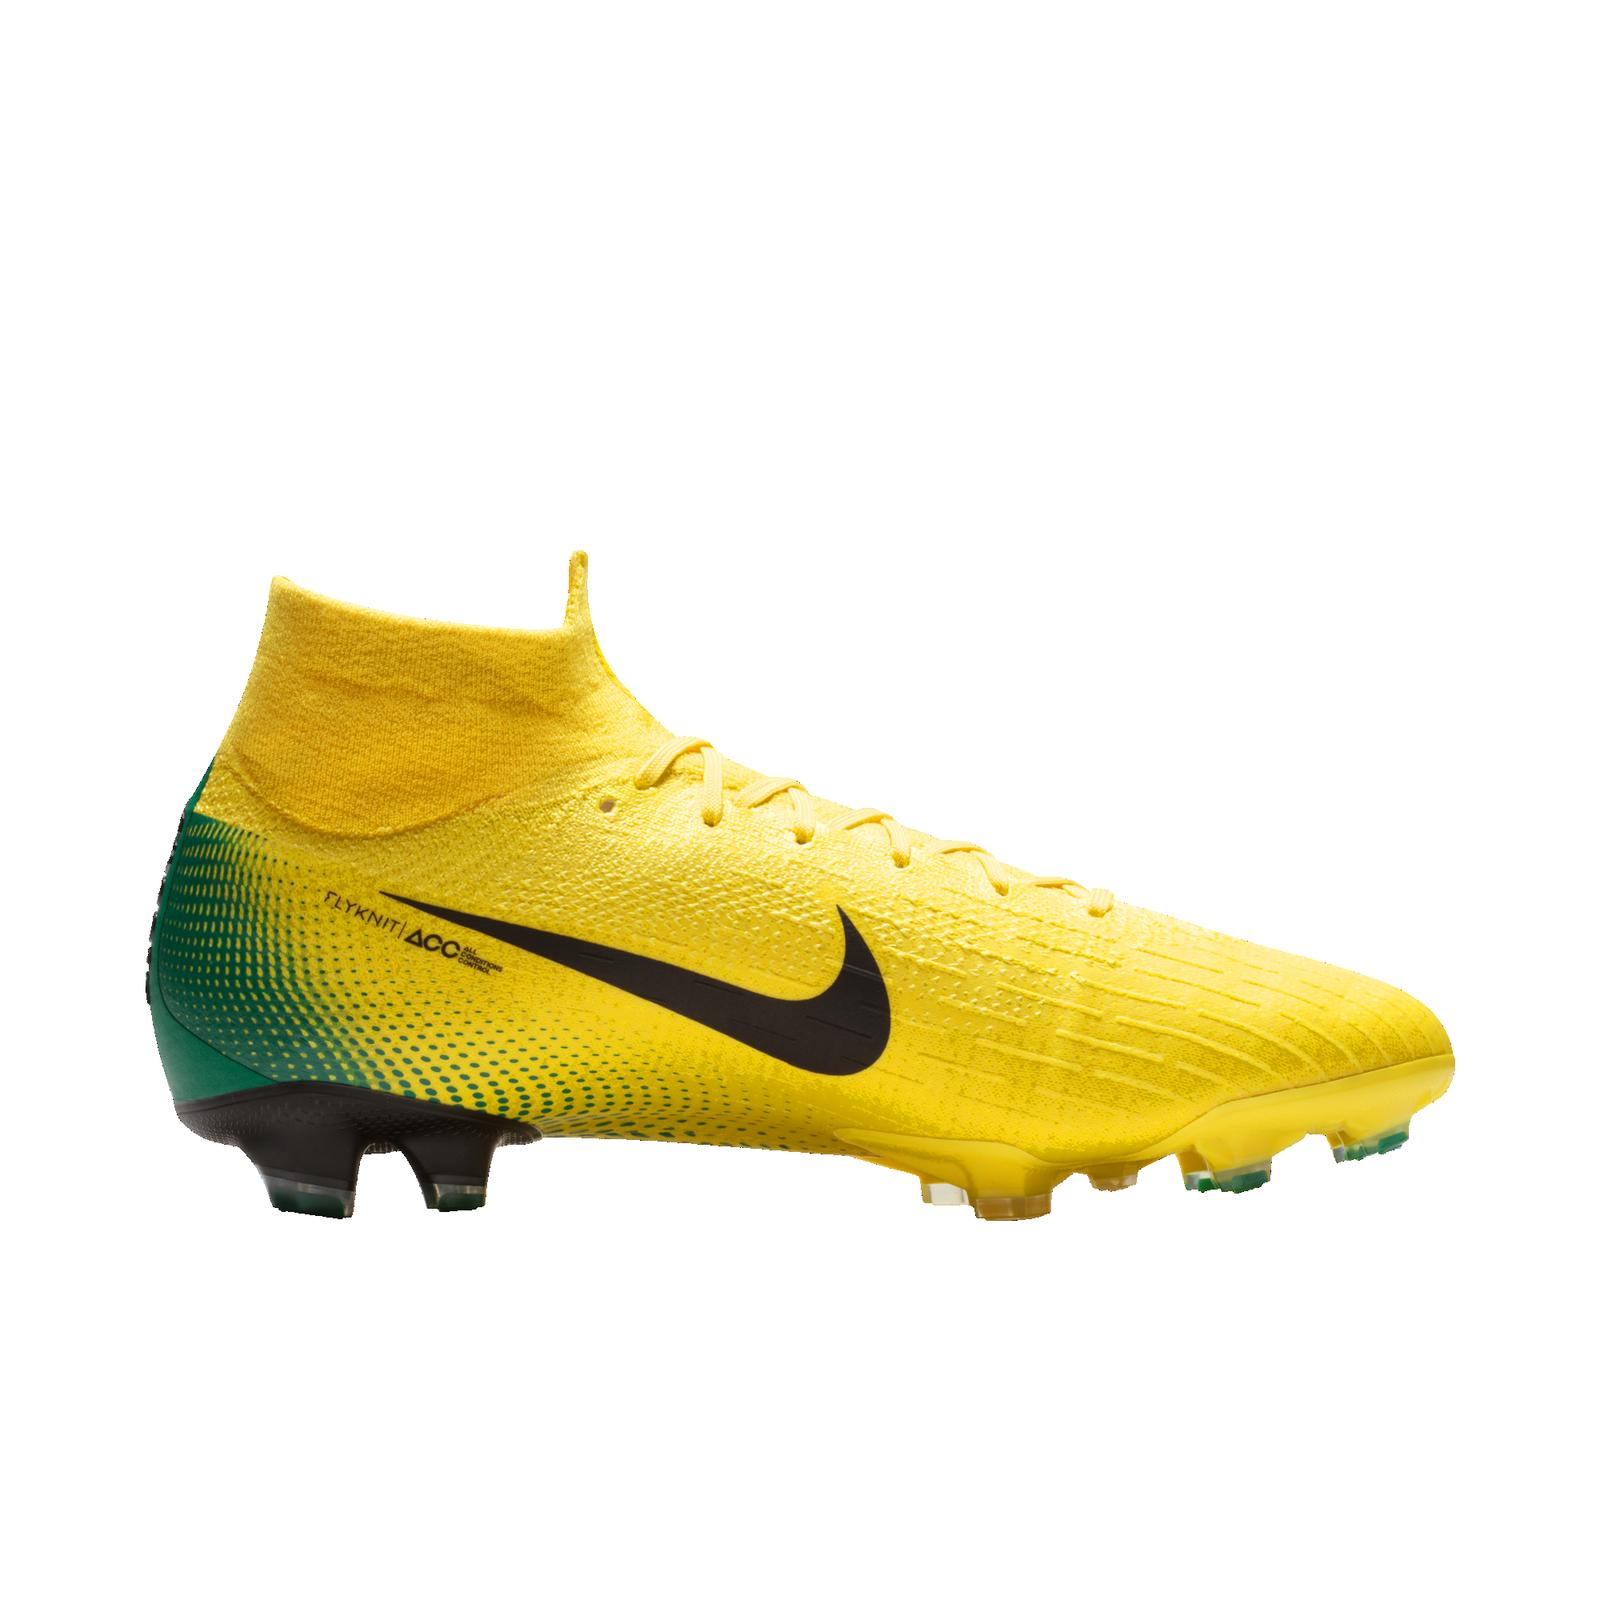 sale retailer b3319 fe953 Nike 1998, 2002, 2006, 2010 and 2014 Mercurial 360 Heritage ...